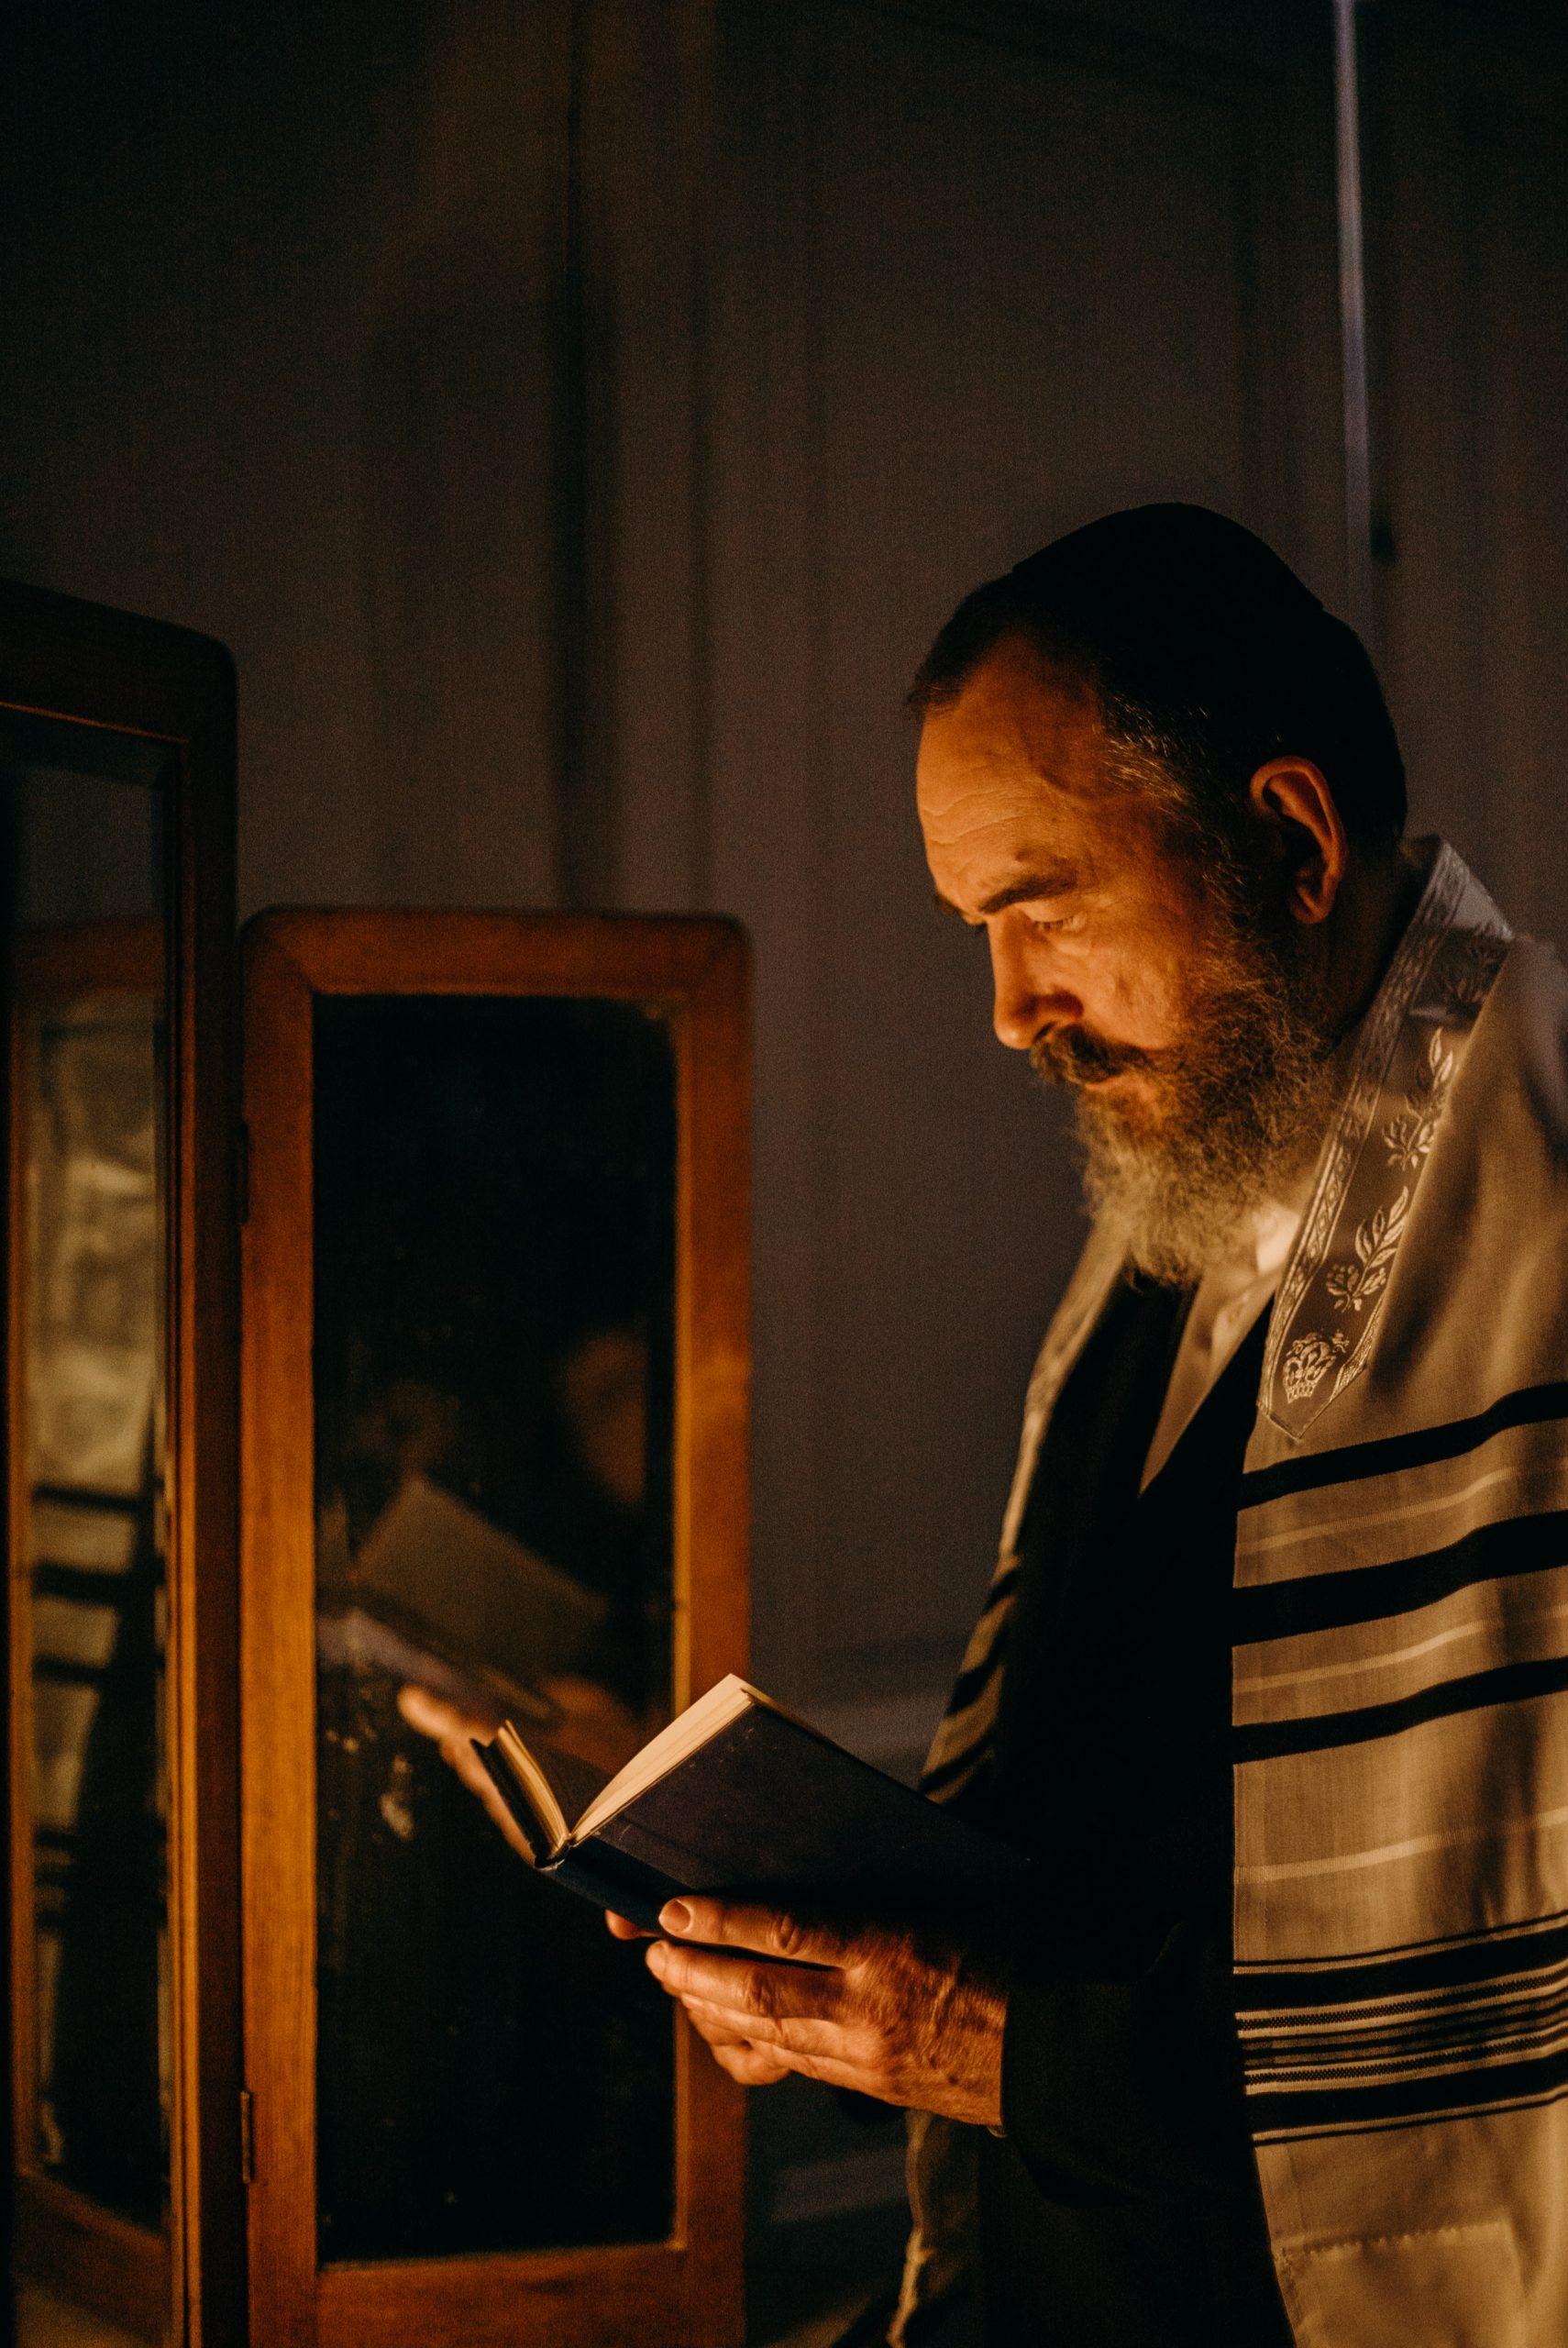 bearded-man-reading-a-book-4033813